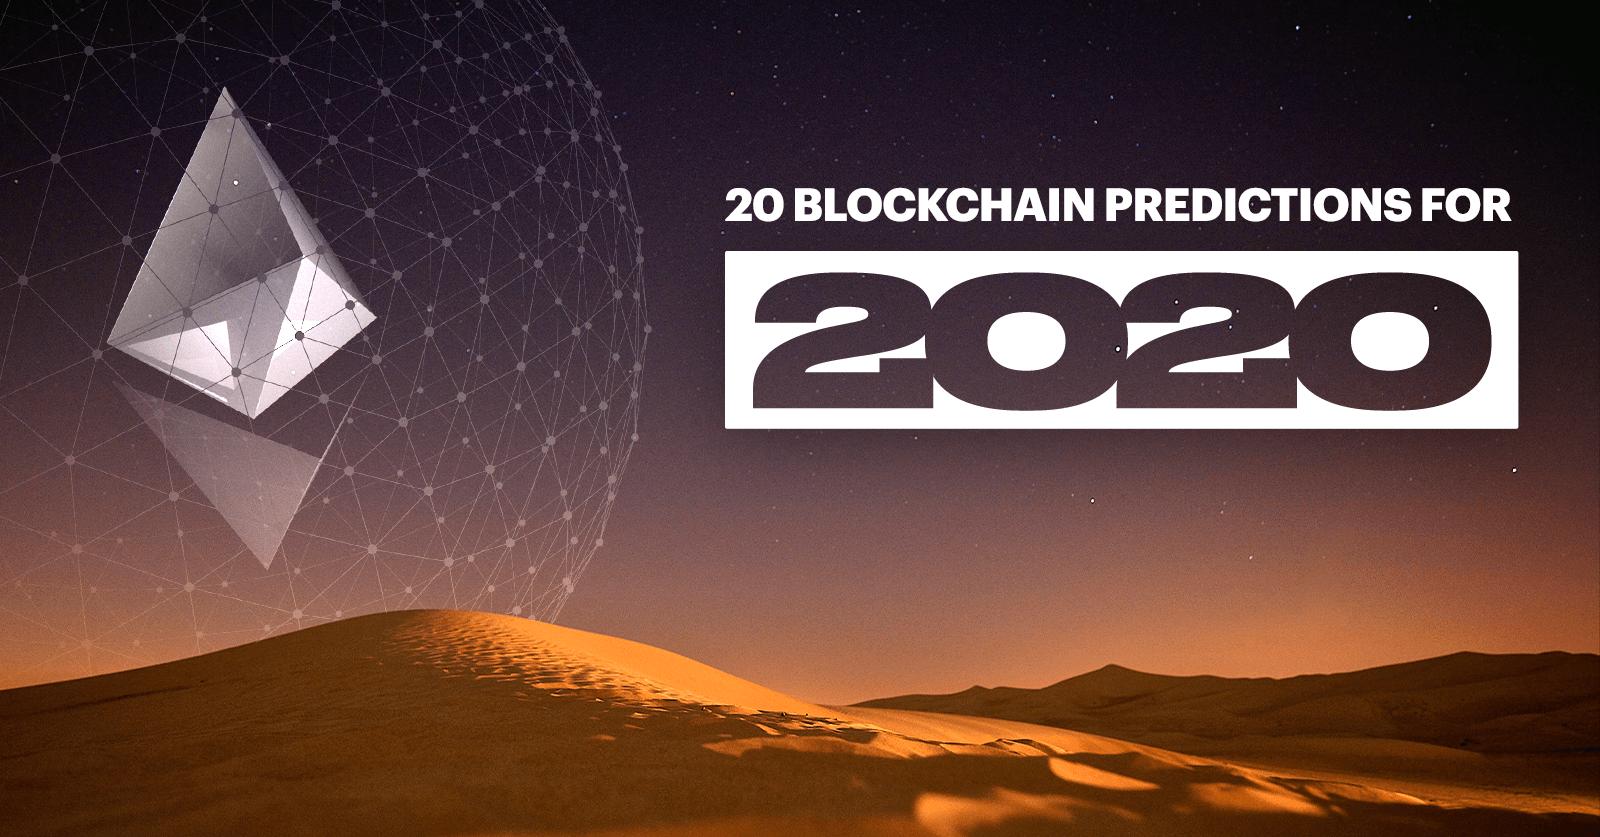 2020 blockchain predictions featured no logo